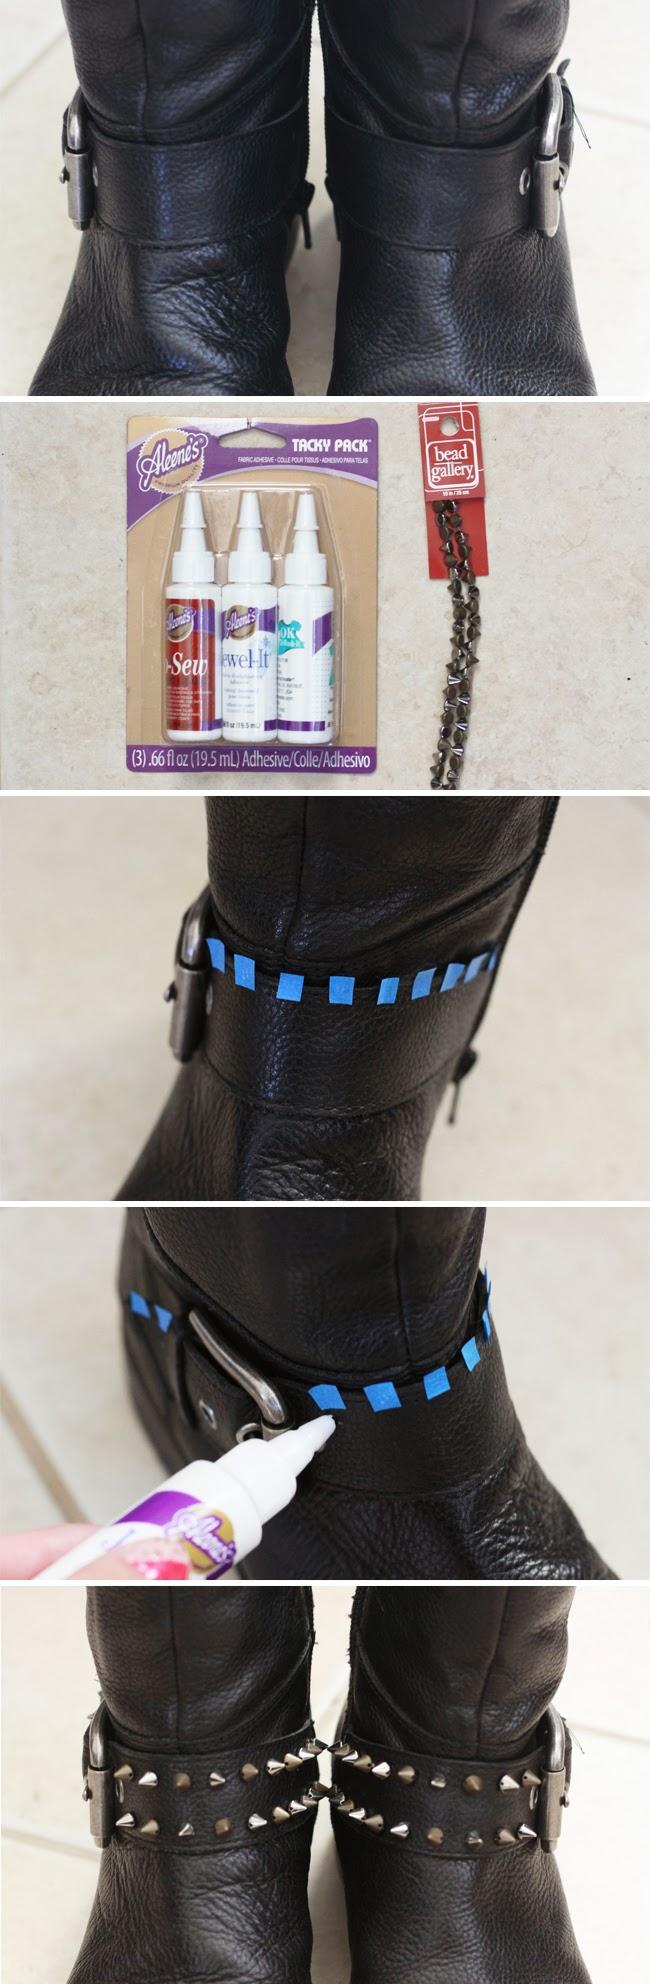 DIY, studded boots, nine west, restyle boots, black leather boots, fashion blogger diy, favorite DIY